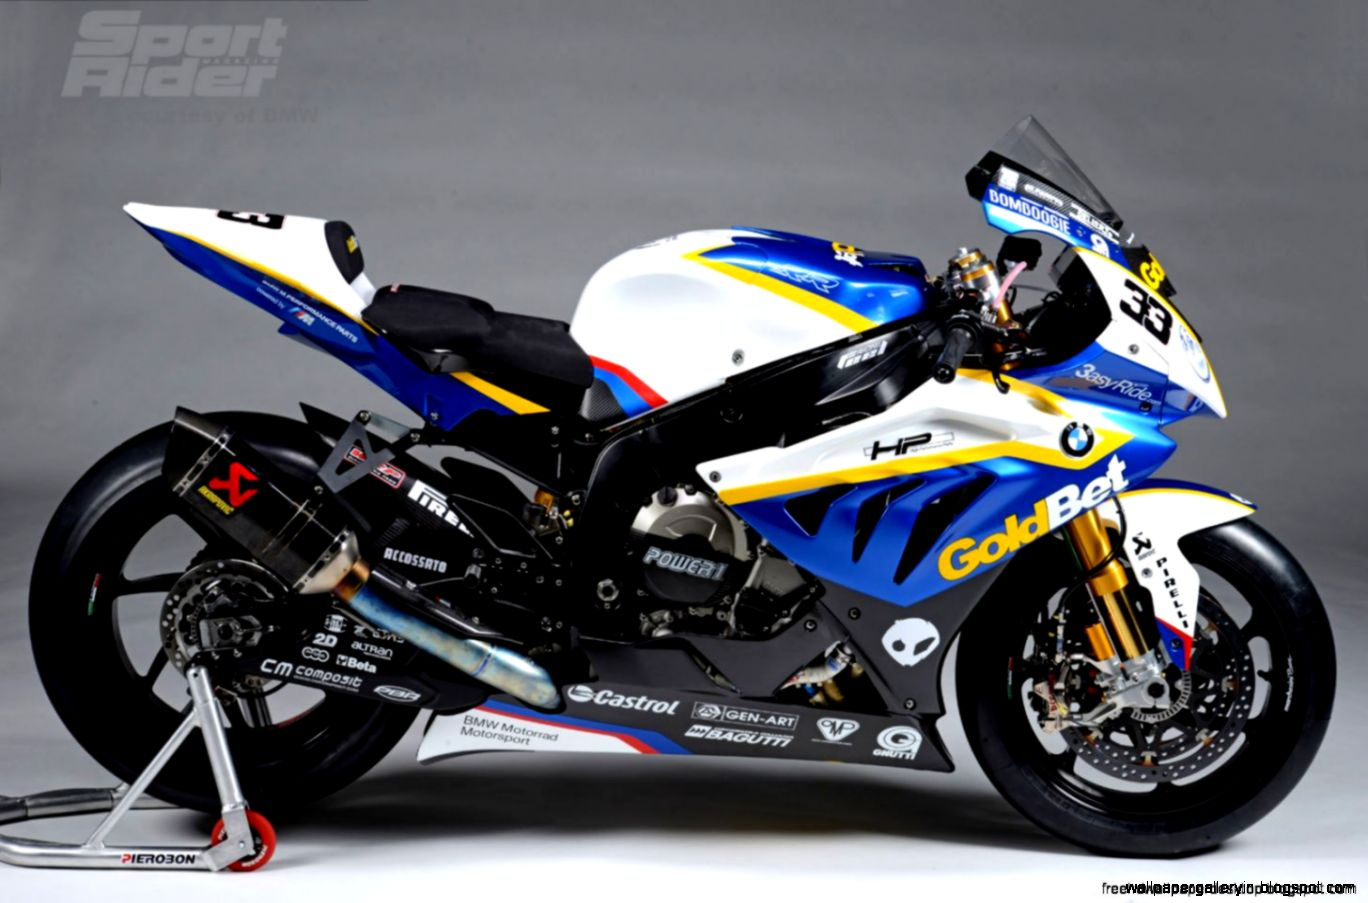 Goldbet Superbike Team Hd  Free High Definition Wallpapers